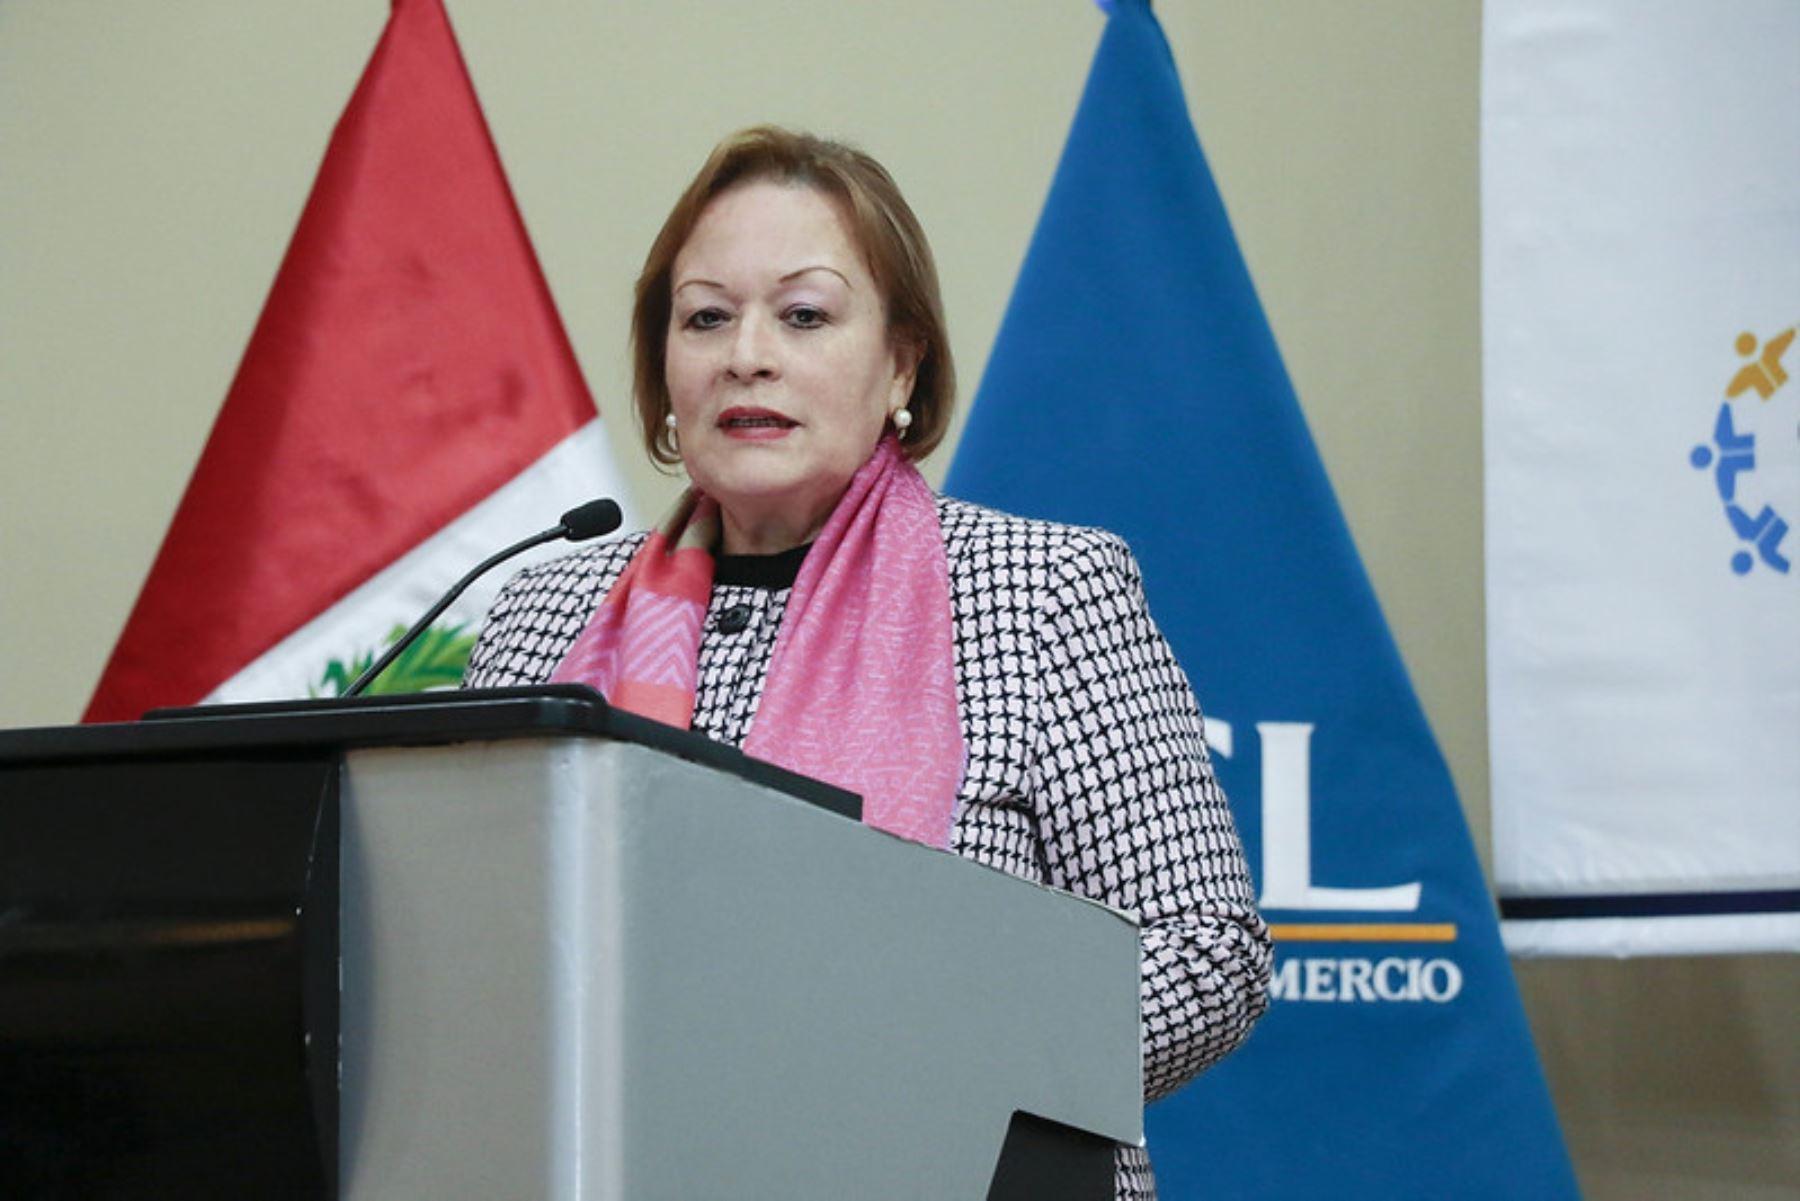 Presidenta de la Cámara de Comercio de Lima (CCL), Yolanda Torriani